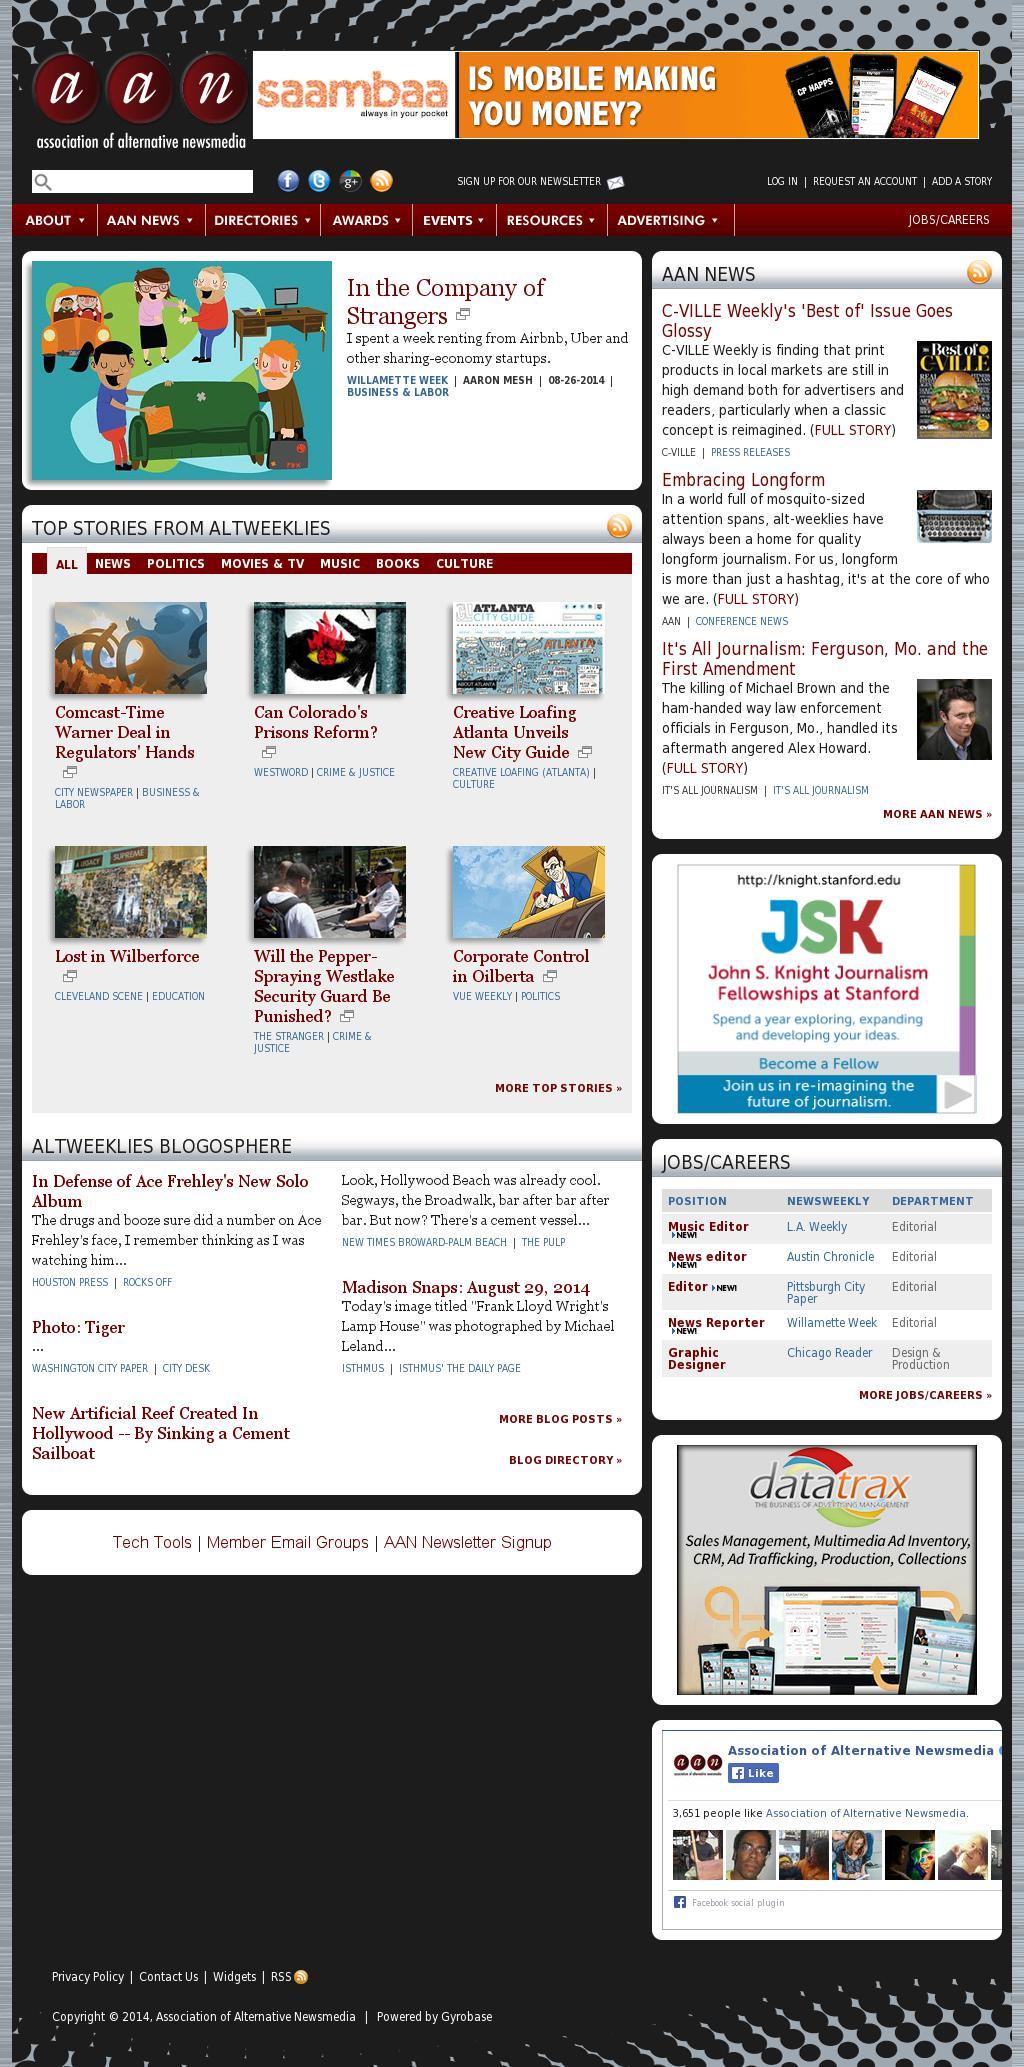 Association of Alternative Newsmedia at Friday Aug. 29, 2014, 3 p.m. UTC